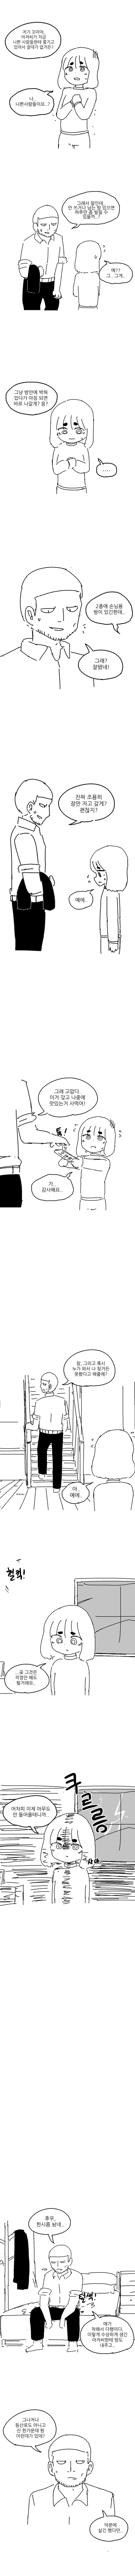 Internet_20191220_072612_4.jpeg 조폭이랑 꼬마 여자애가 하룻밤 보내는.manhwa